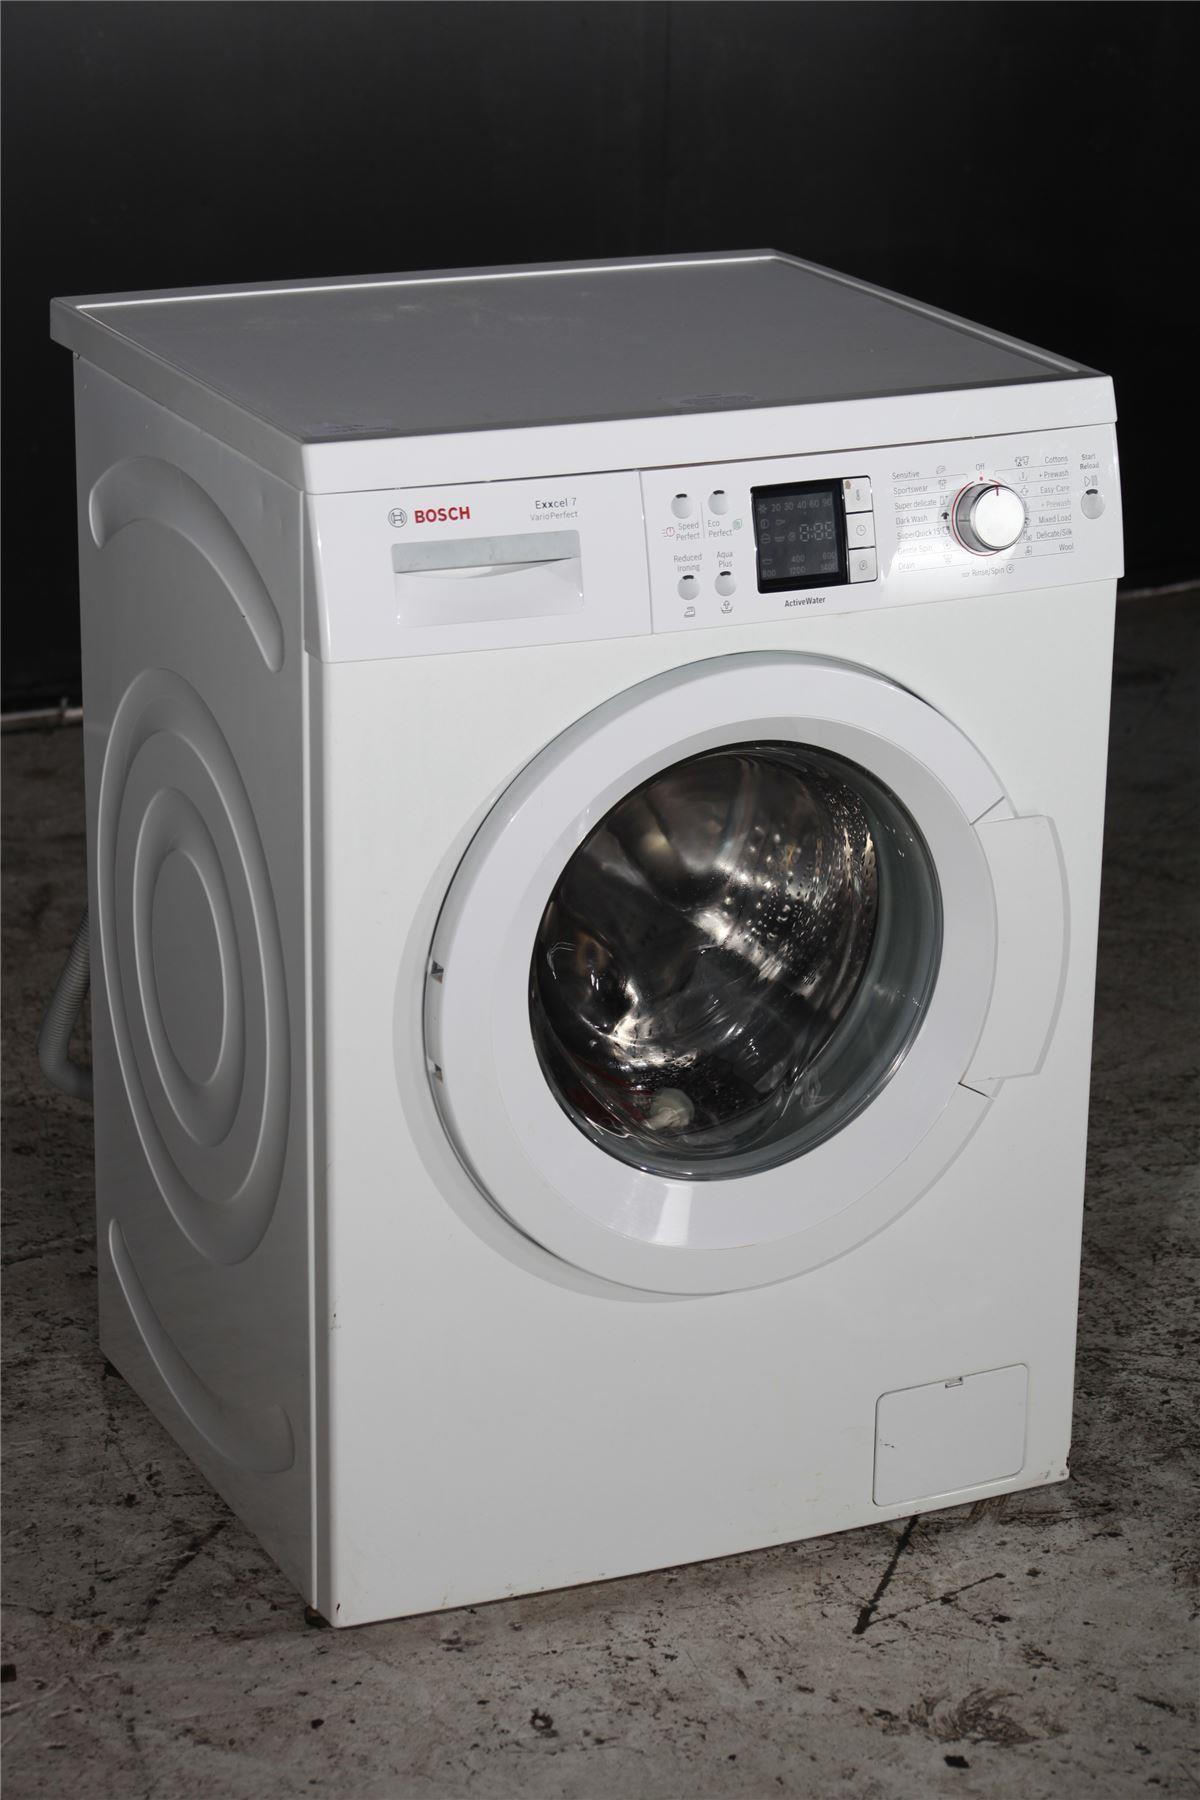 machine a laver bosch 7kg bosch 7kg washing machine. Black Bedroom Furniture Sets. Home Design Ideas